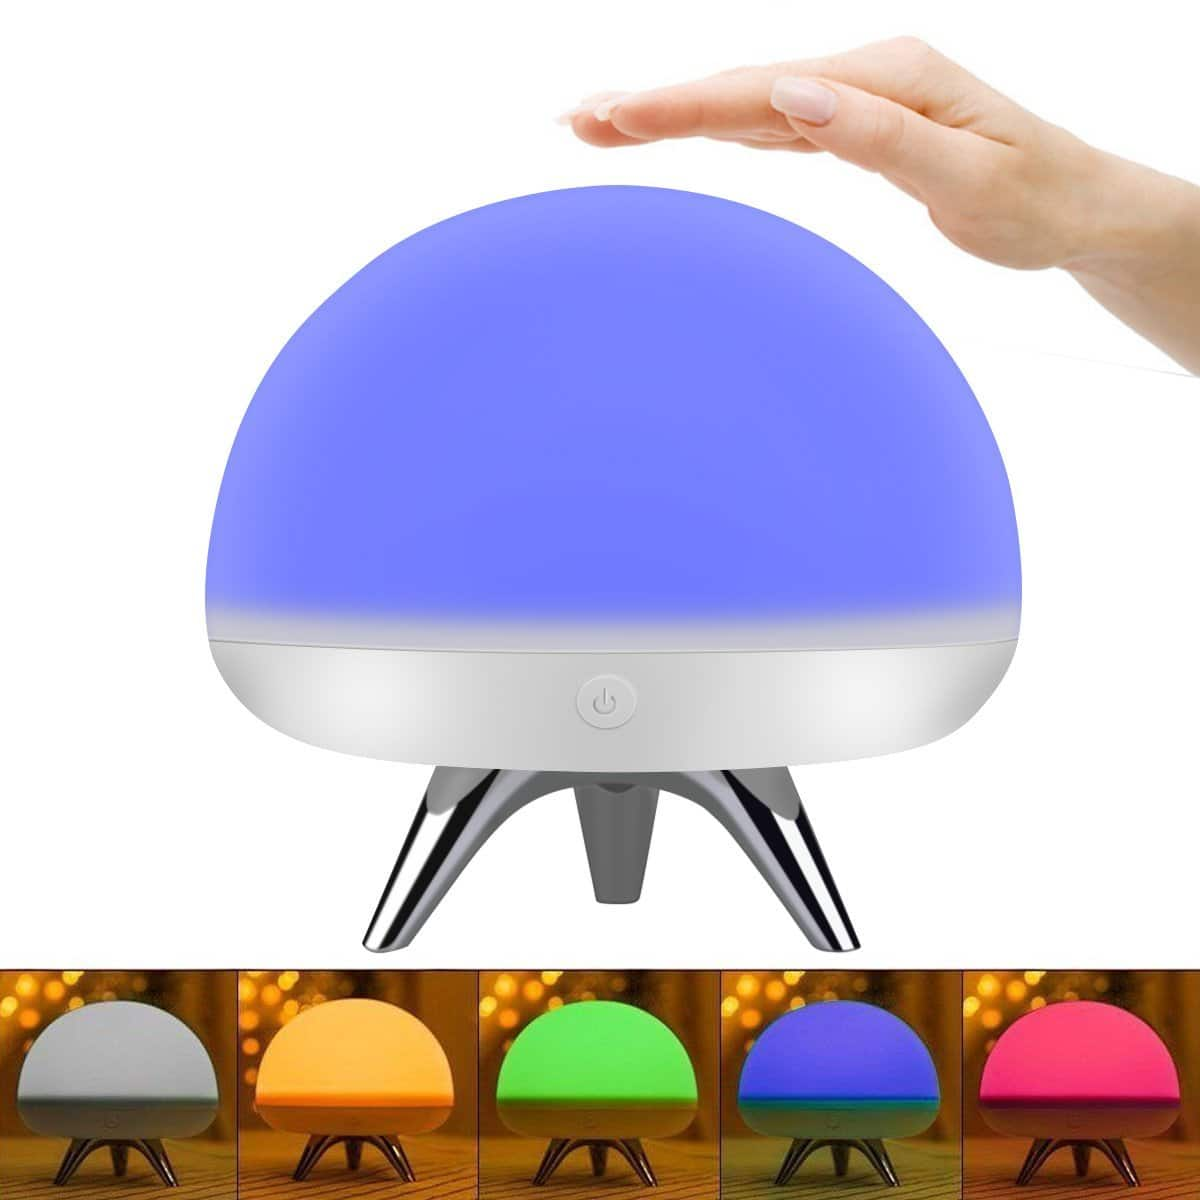 Portable Soft Silicone Decorative LED Touch Desk Lamp Nightlight @Amazon $7.60 AC